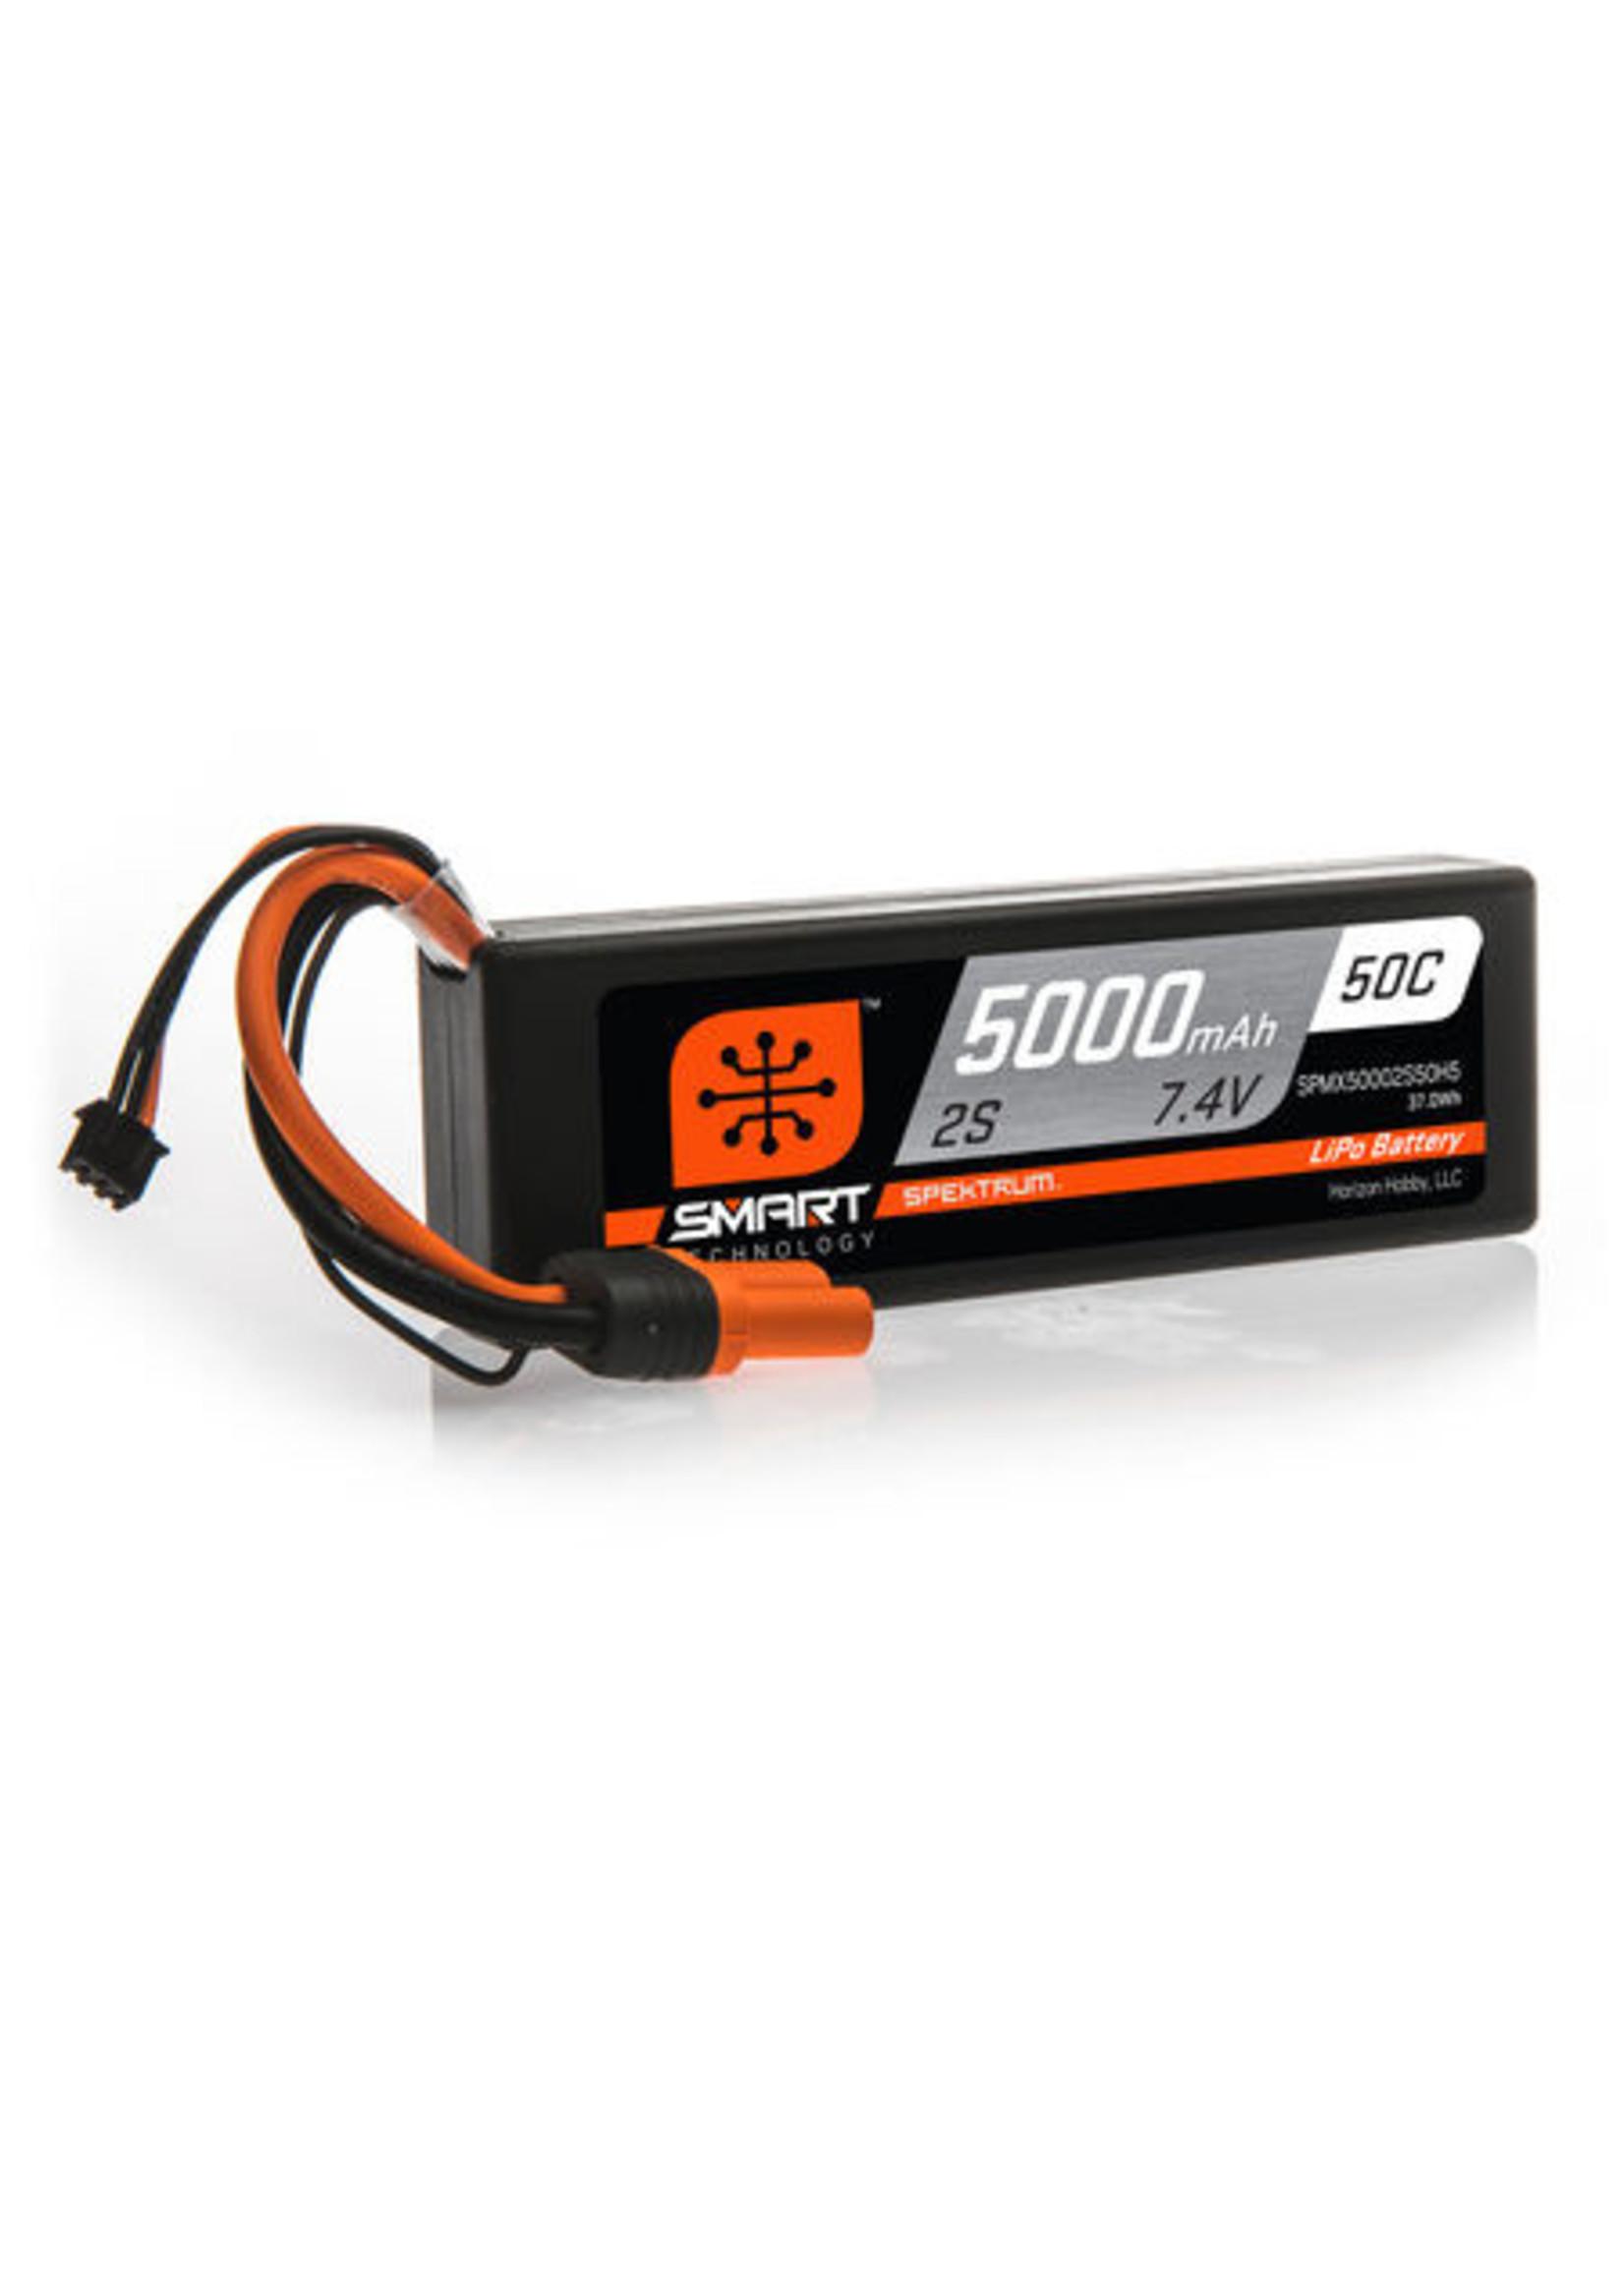 Spektrum SPMX50002S50H5 Spektrum 5000mAh 2S 7.4V 50C Smart LiPo Hardcase; IC5